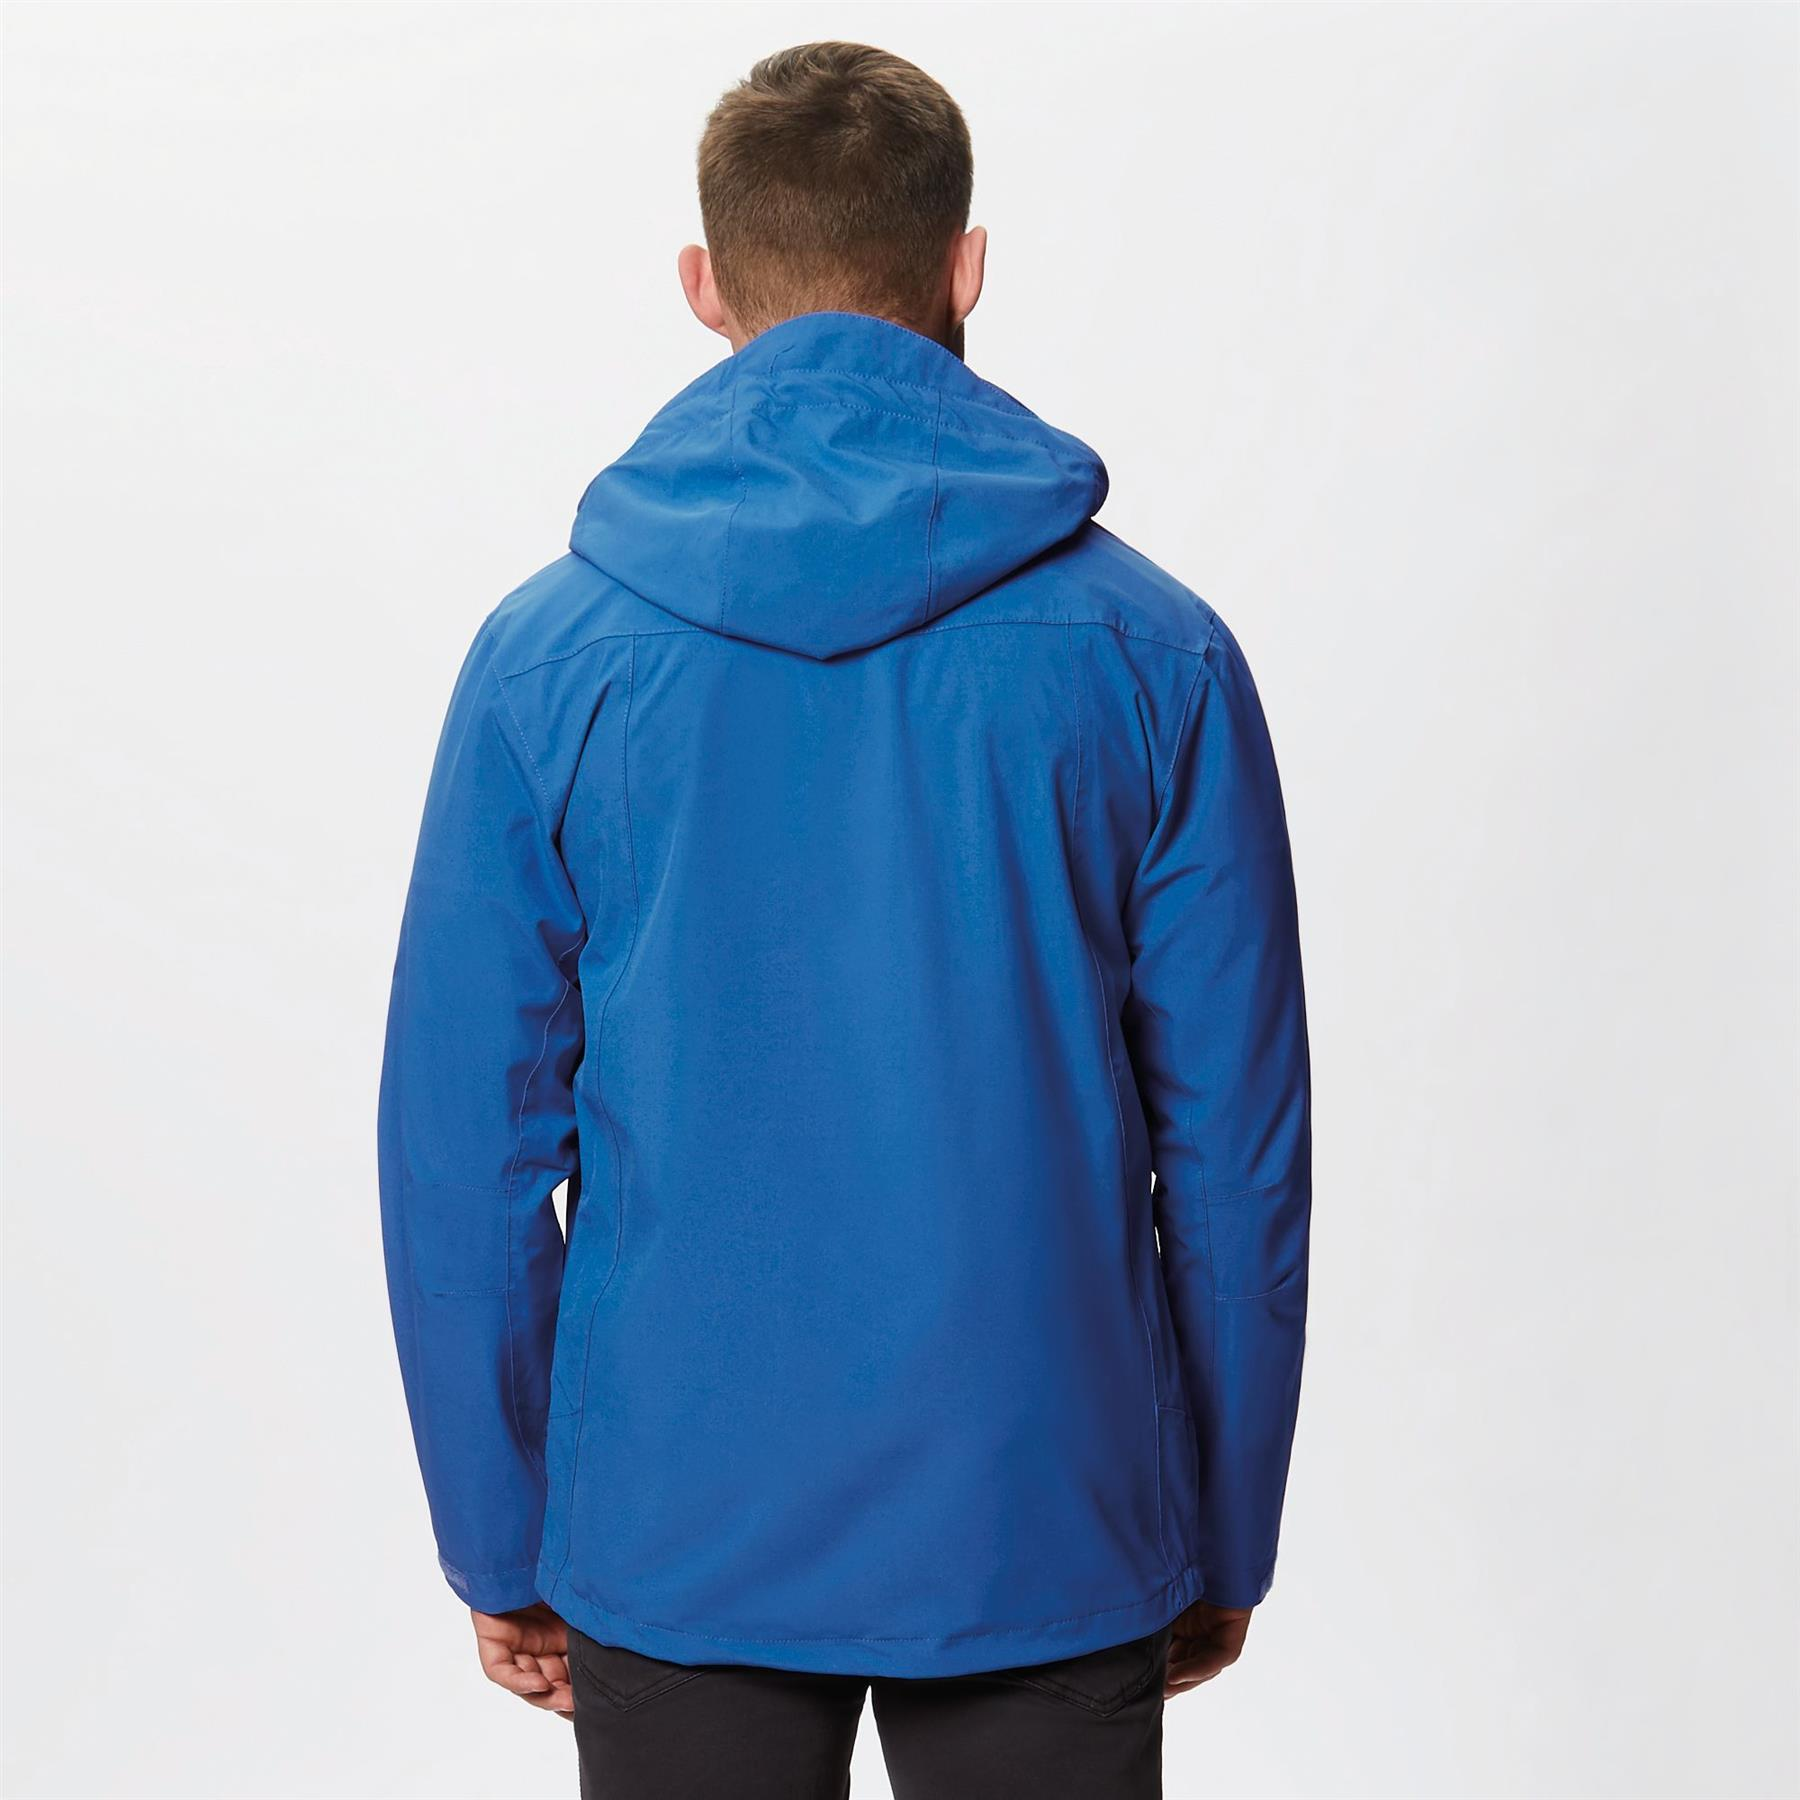 miniatuur 8 - Regatta Mens X-Pro Exosphere Stretch Waterproof Hooded Jacket